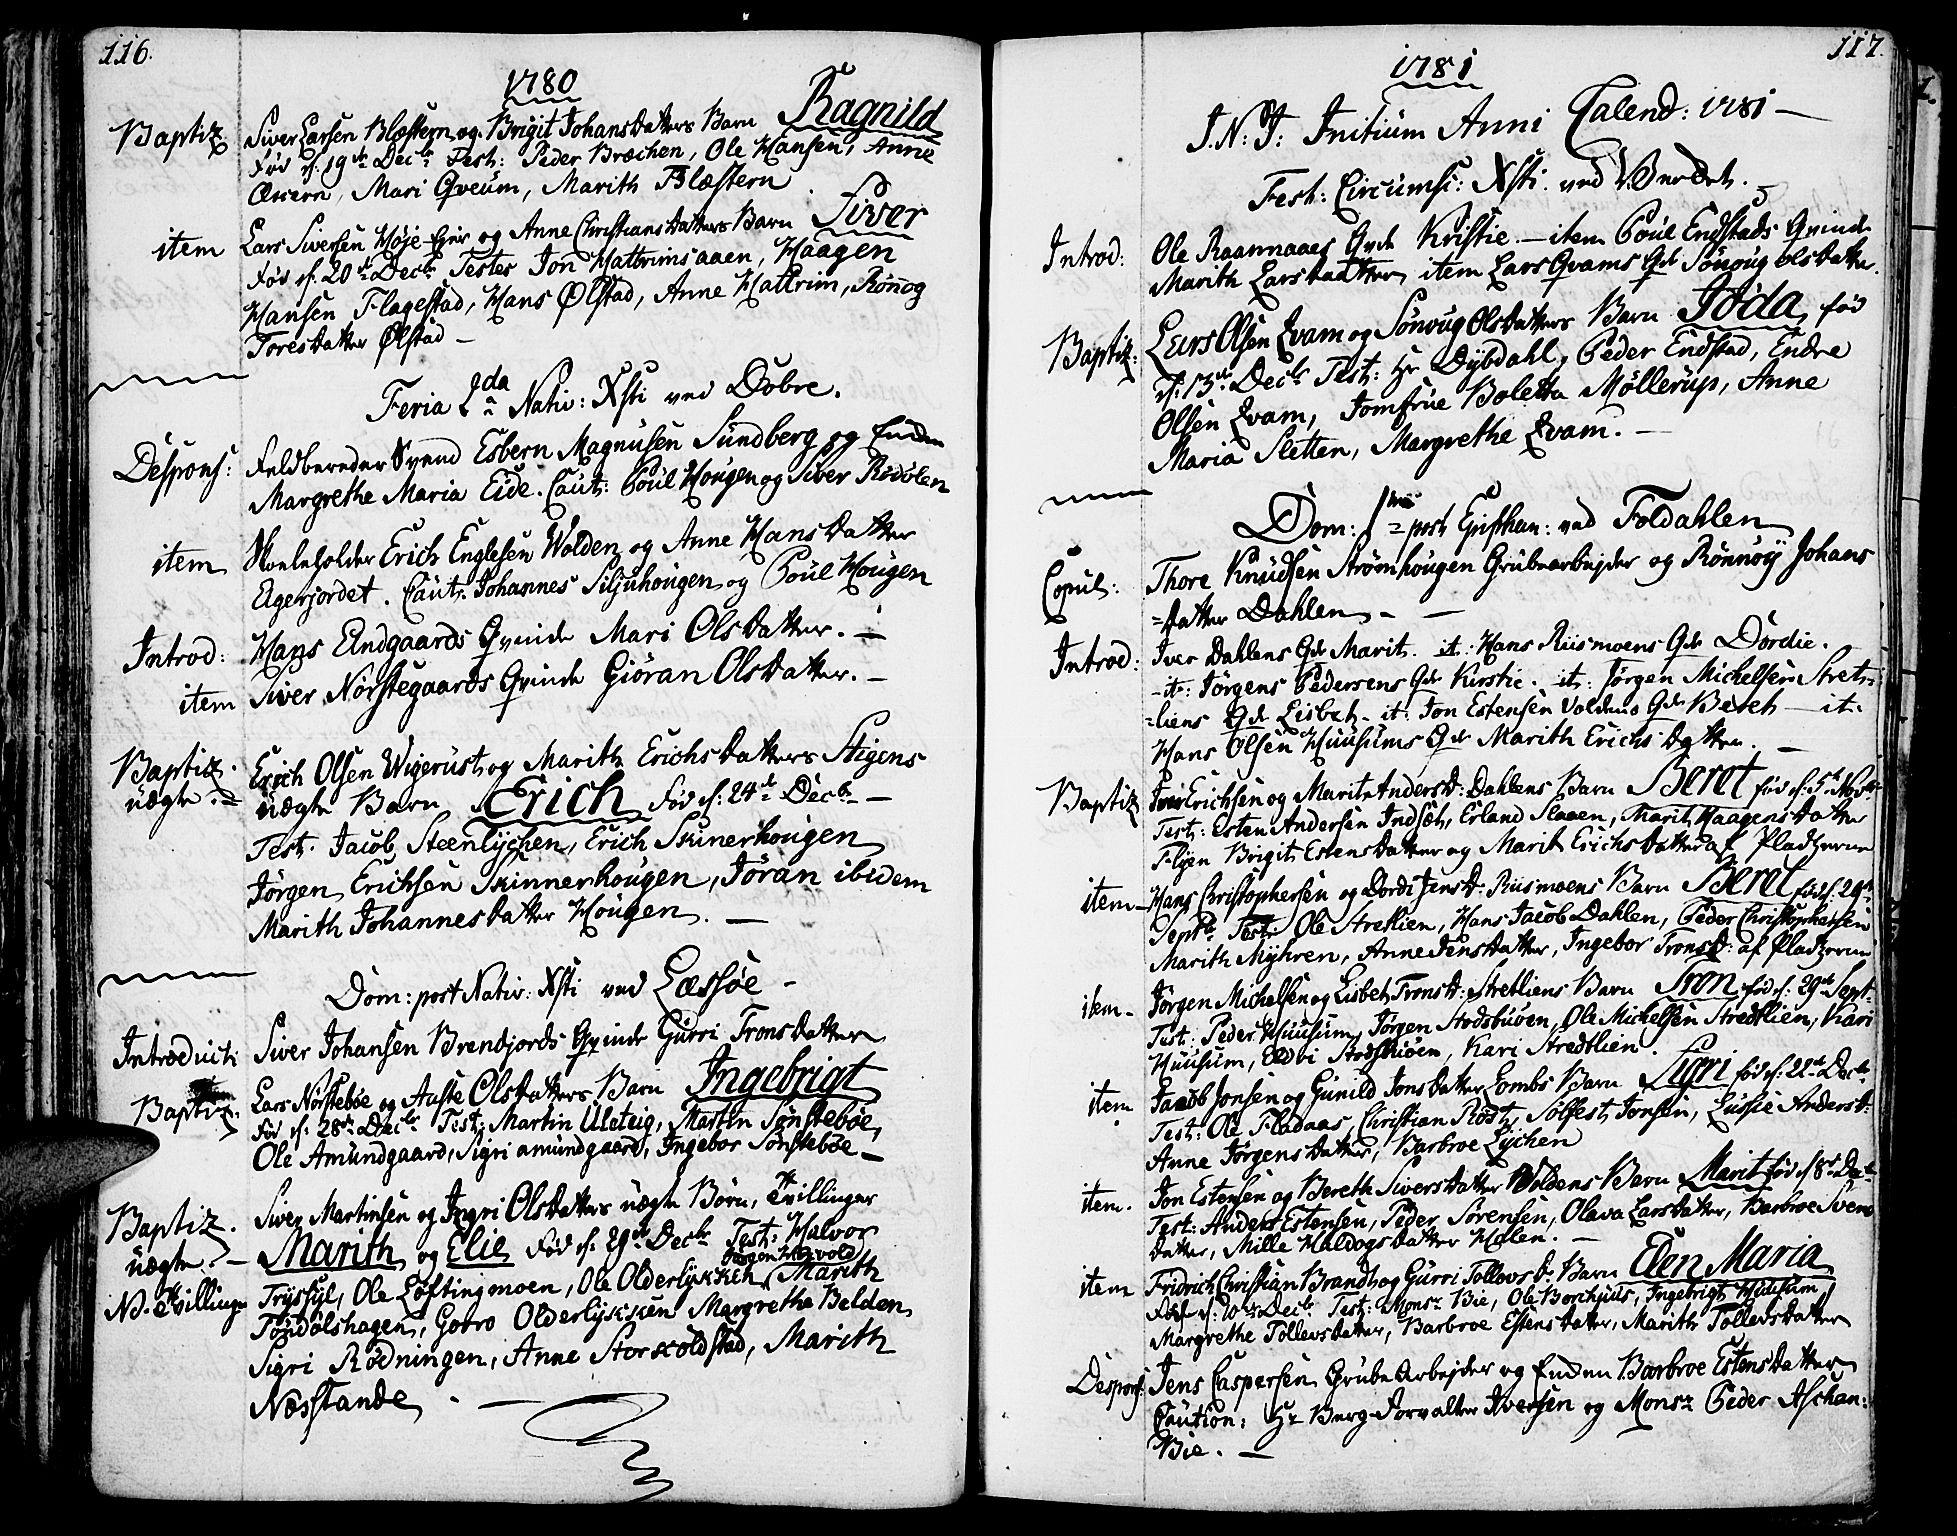 SAH, Lesja prestekontor, Ministerialbok nr. 3, 1777-1819, s. 116-117